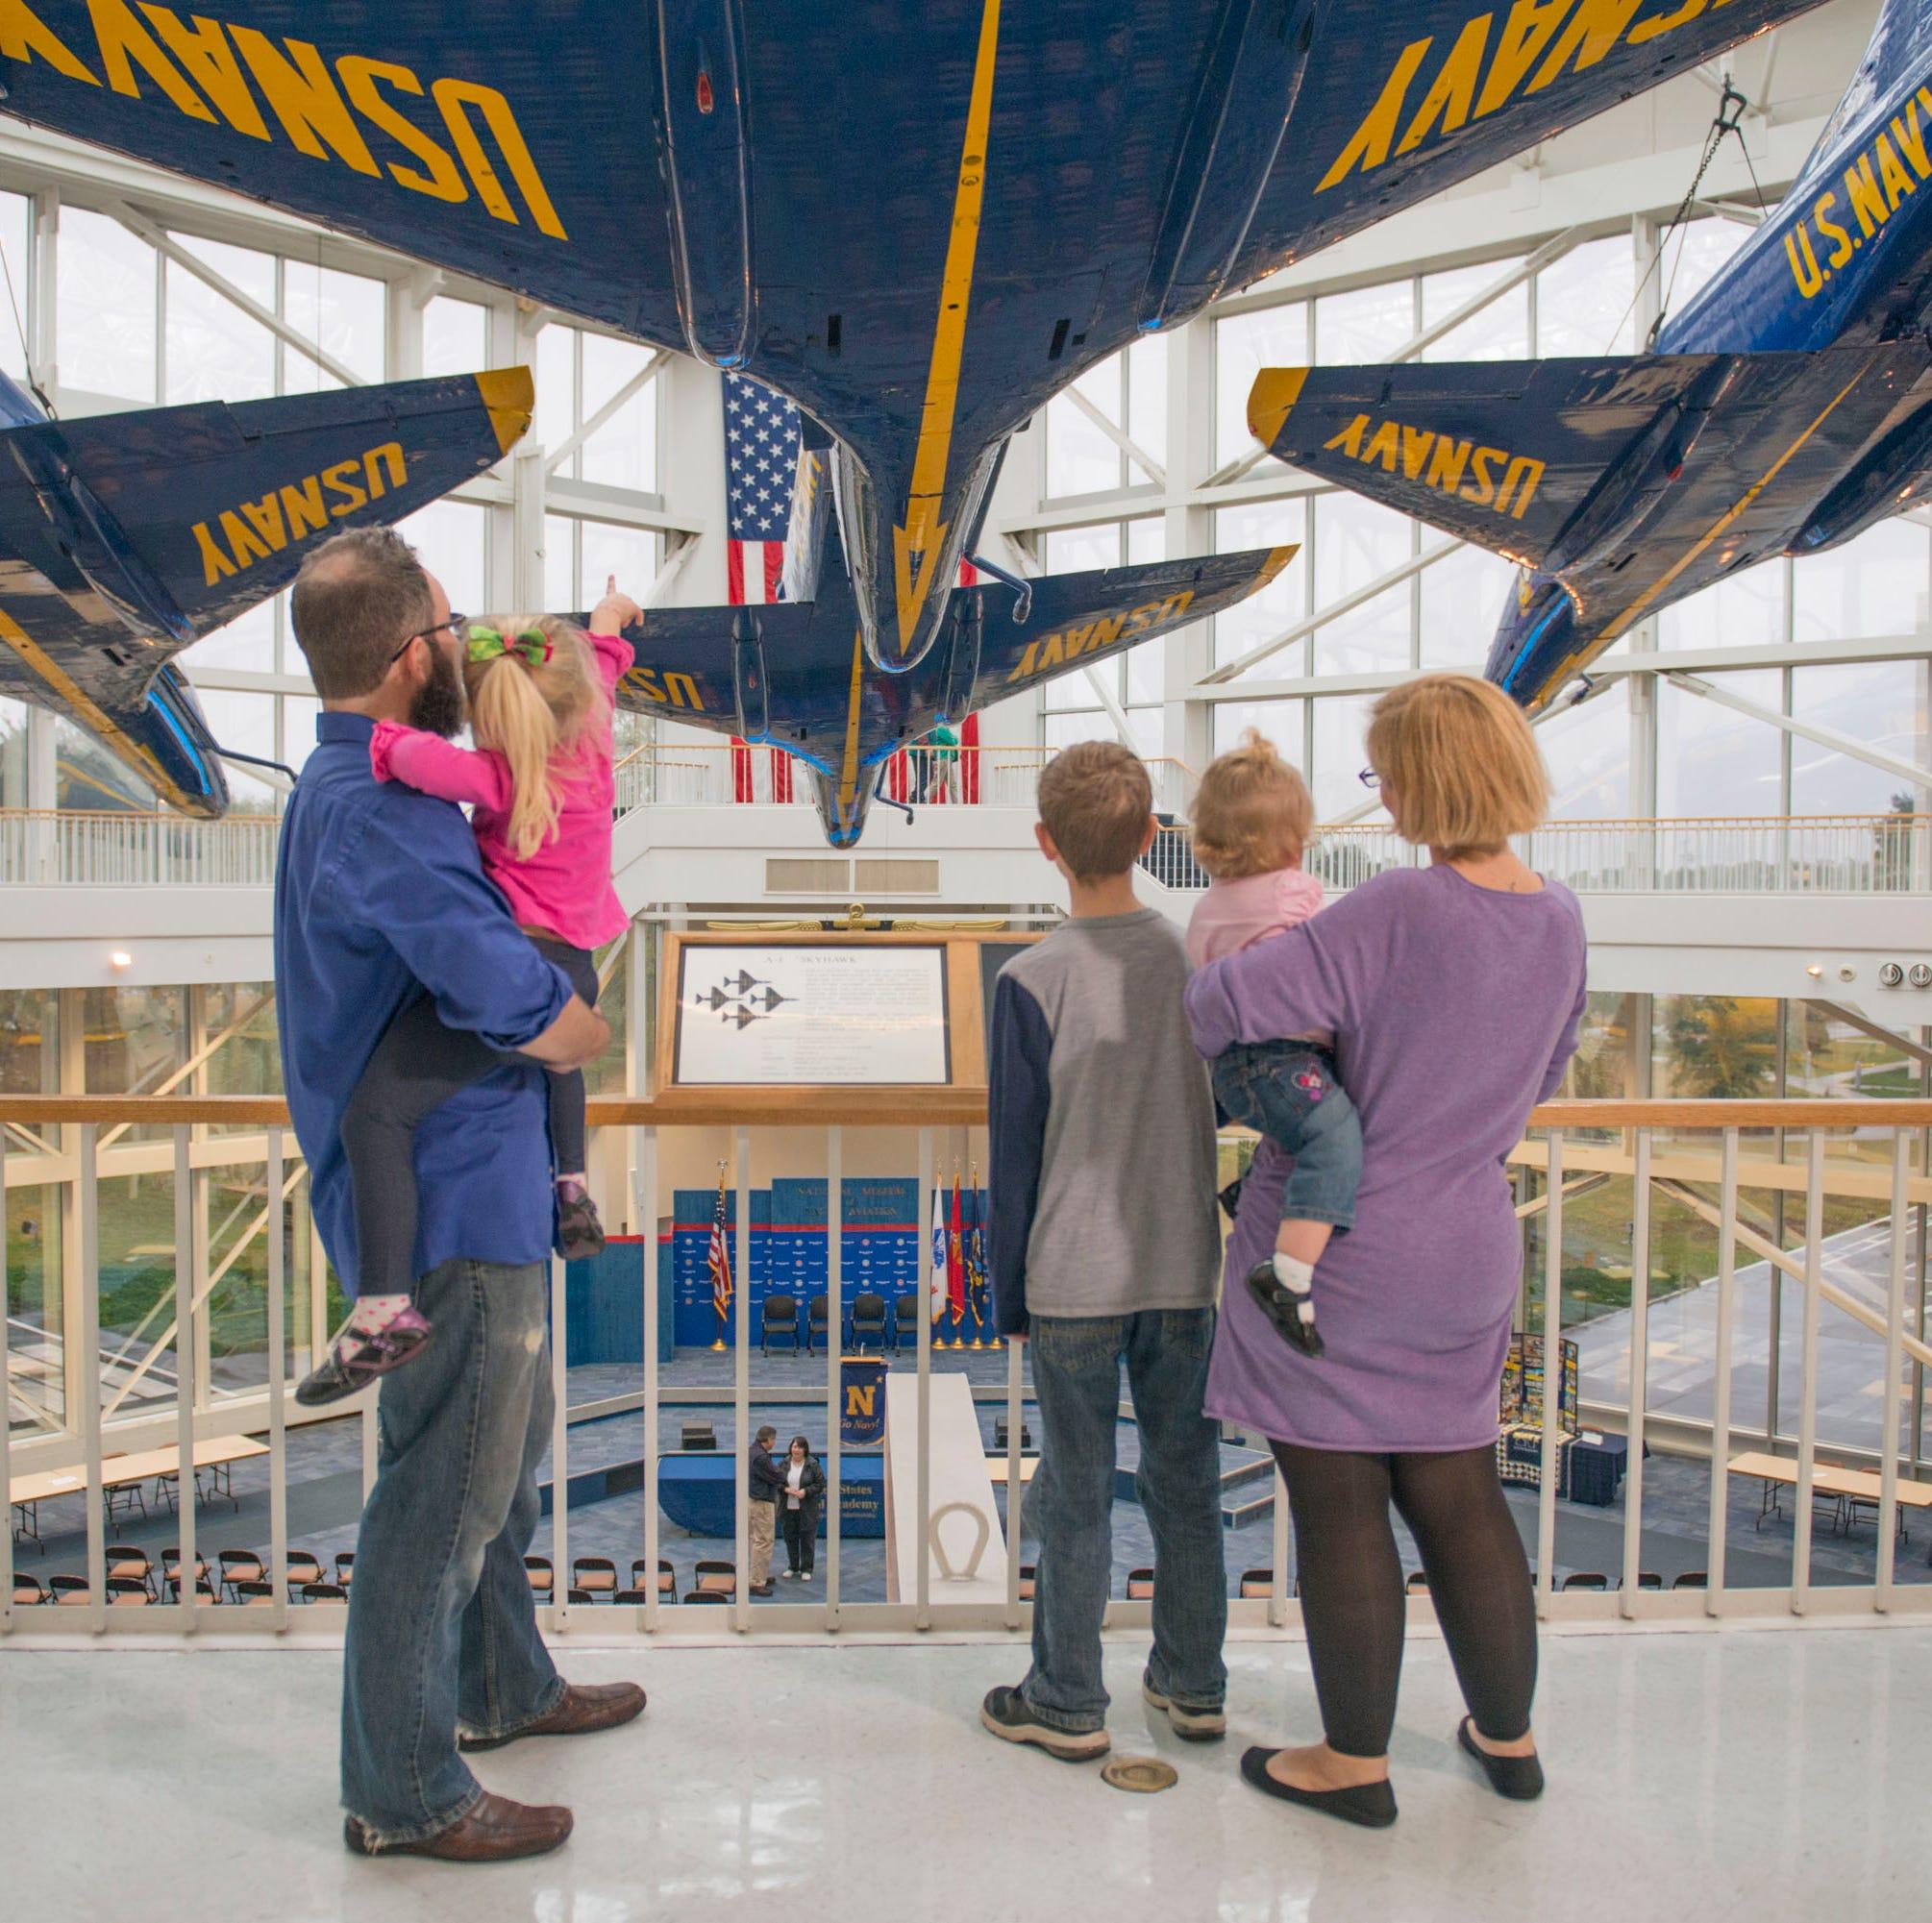 TripAdvisor names National Naval Aviation Museum in top 25 list among Smithsonian